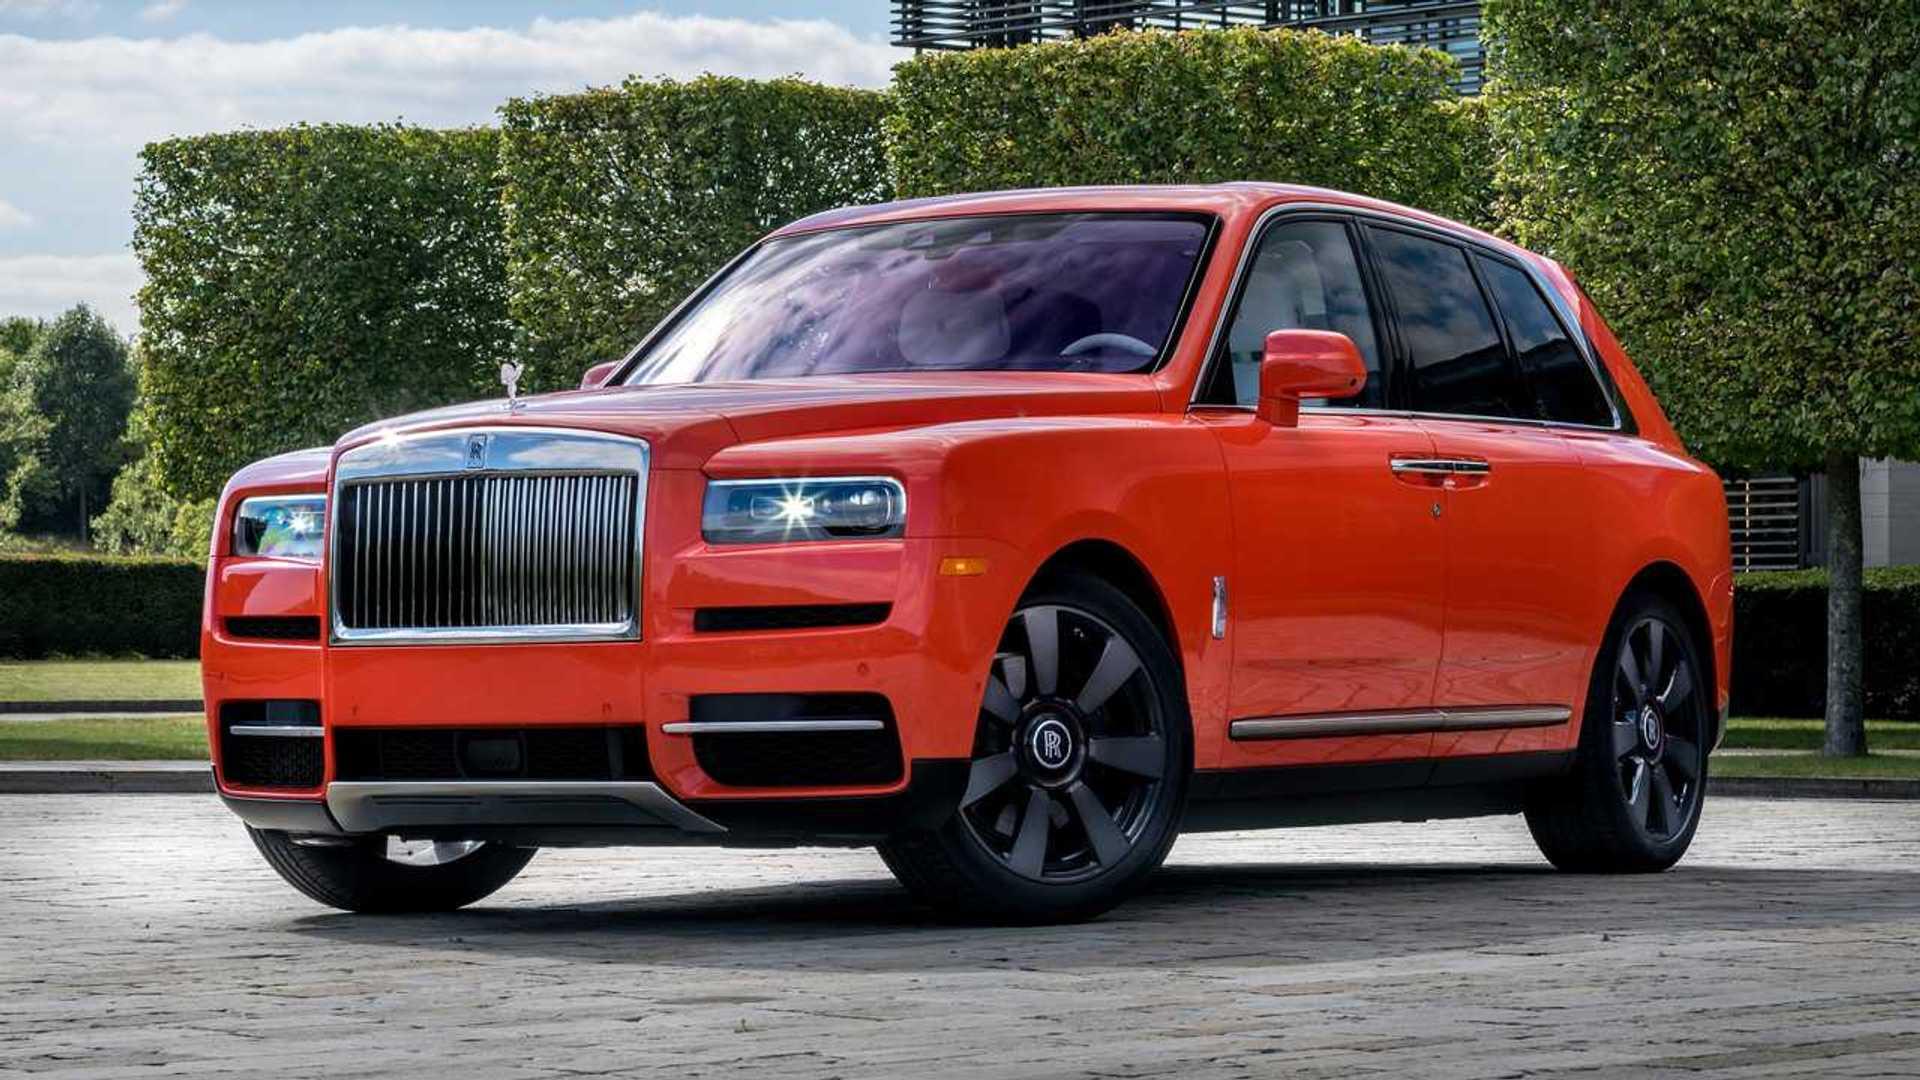 Guy Owns 10 Rolls Royce Bespoke Colors Including Orange Cullinan